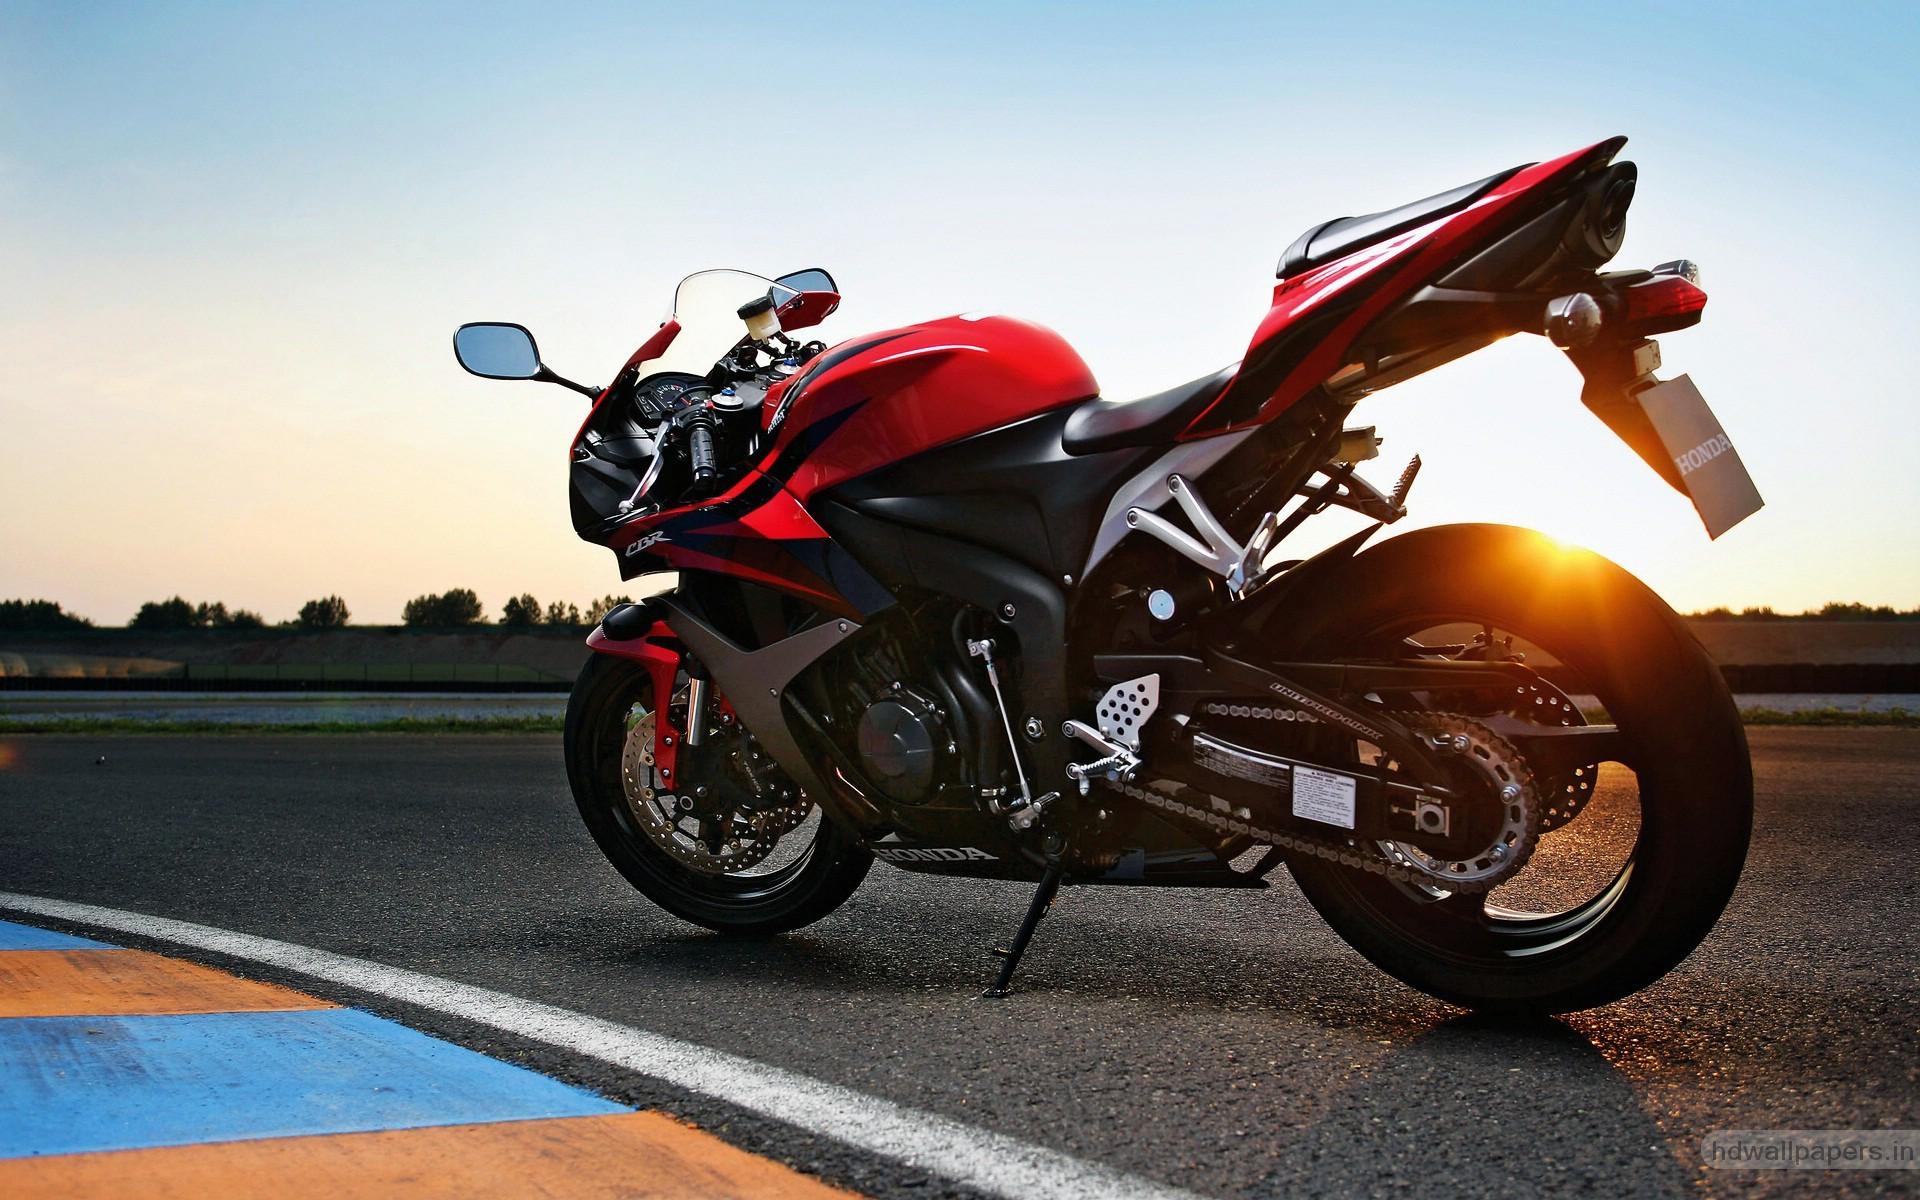 Honda CBR 600RR Red HD Bike Photo HD Wallpapers 1920x1200